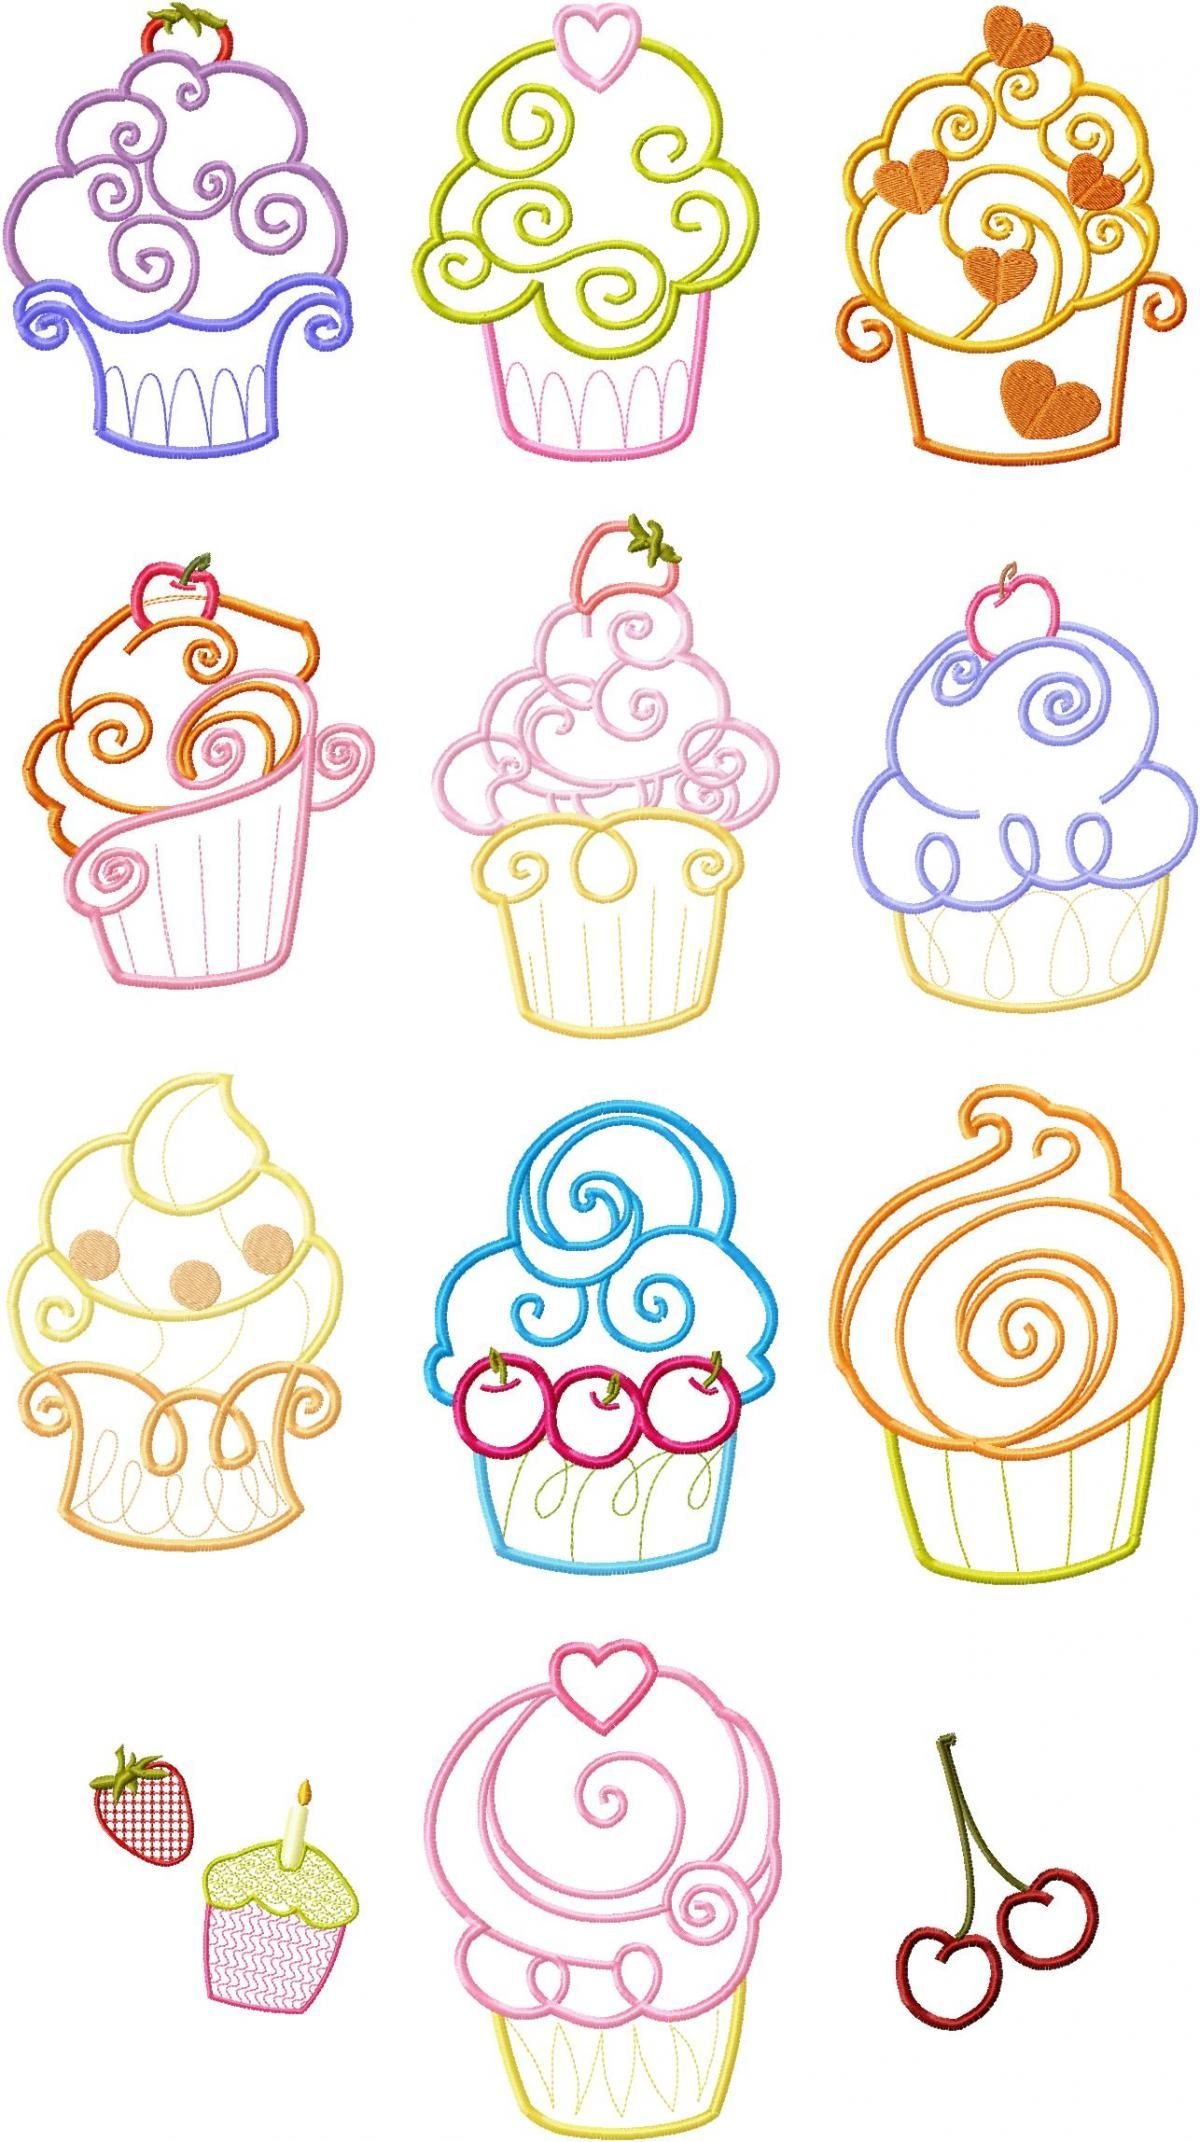 4x4 Set Cupcake Cup Cake Applique Machine Embroidery Designs Machine Embroidery Designs Applique Embroidery Designs Machine Embroidery